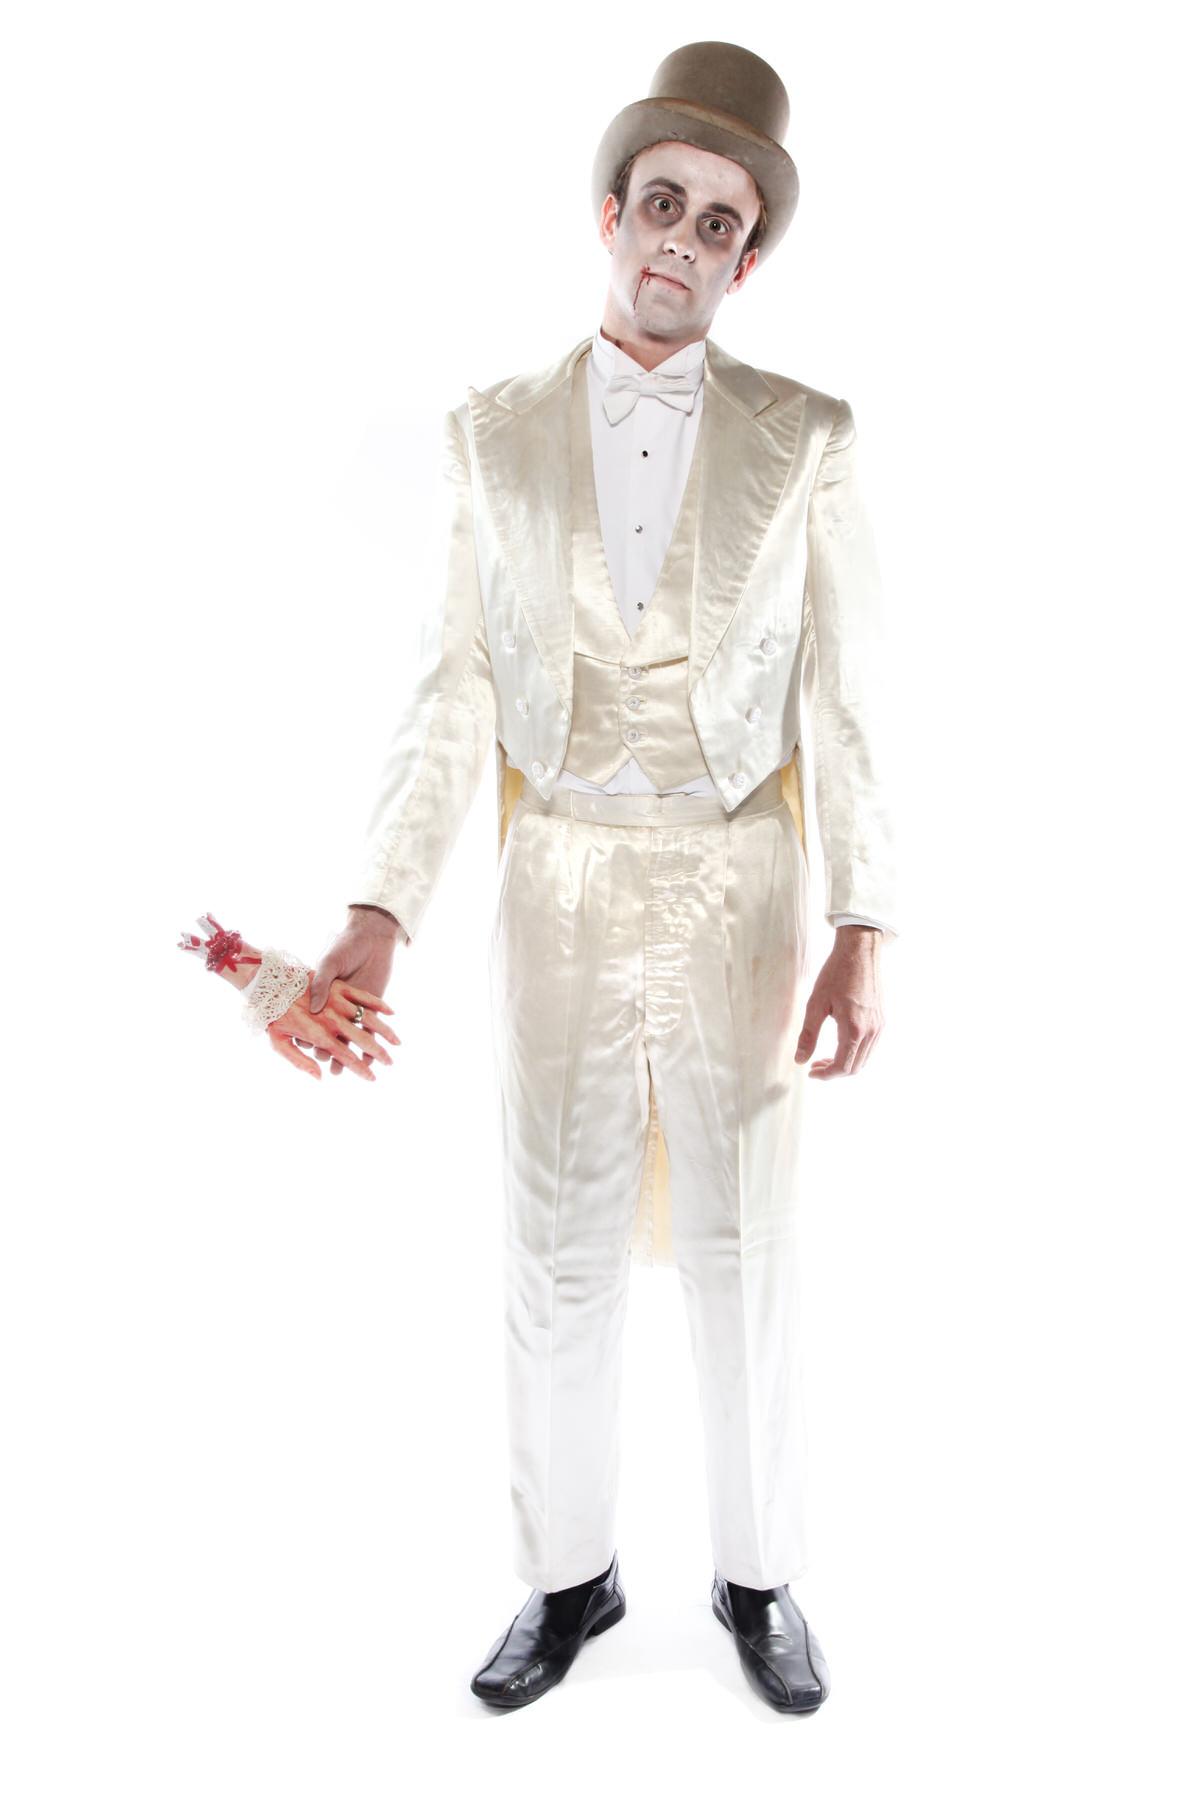 DEAD GROOM WHITE SATIN SUIT COSTUME W TOP HAT